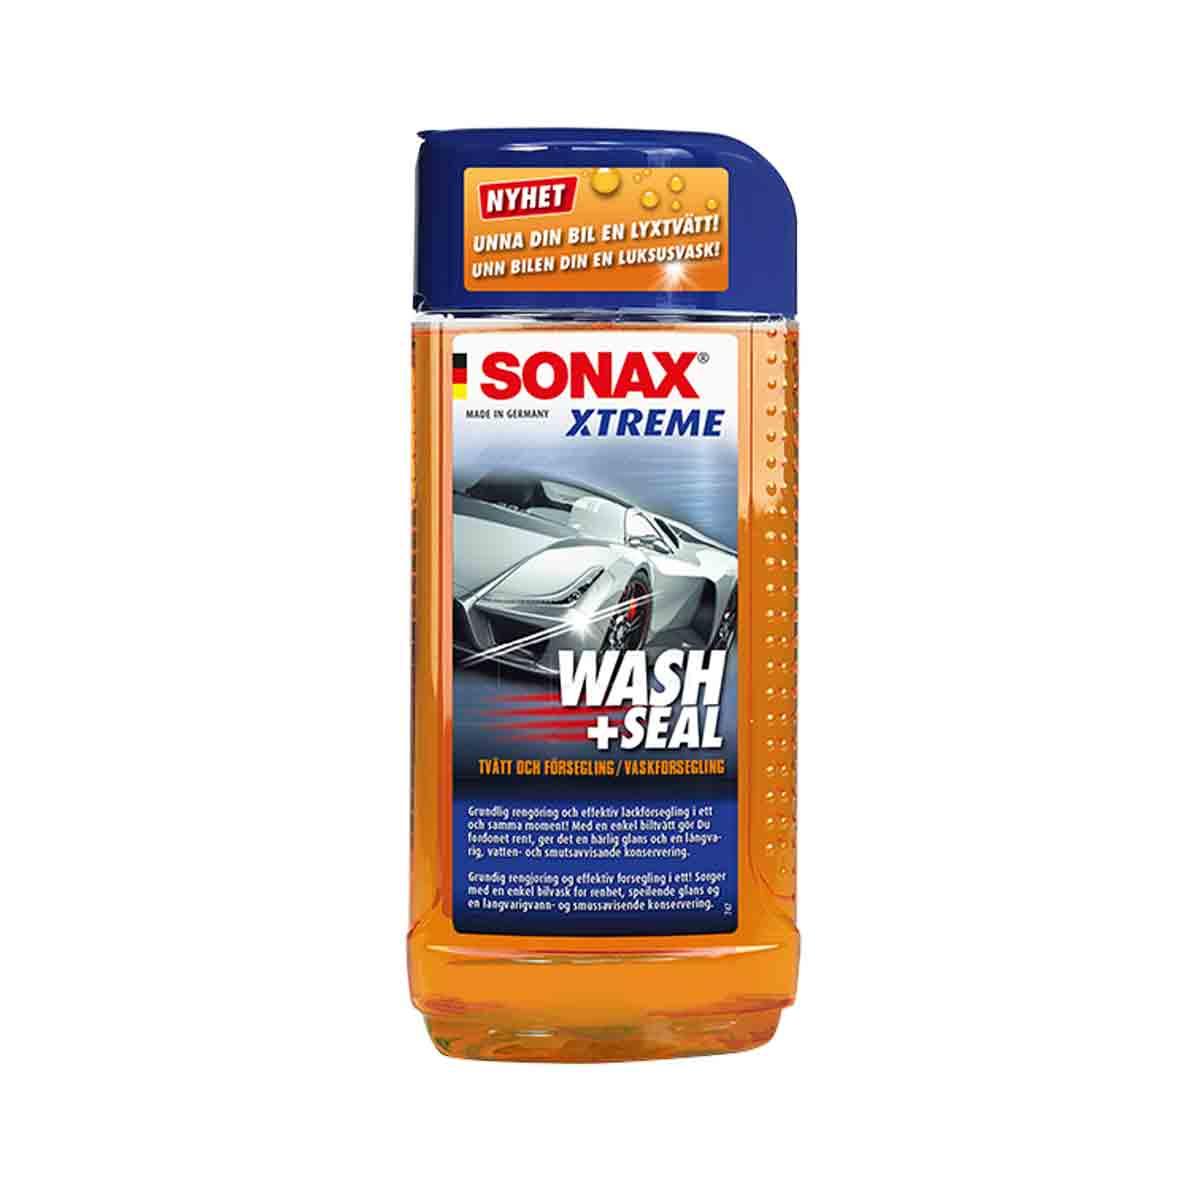 Bilschampo Sonax Xtreme Wash + Seal, 500 ml, 2 st